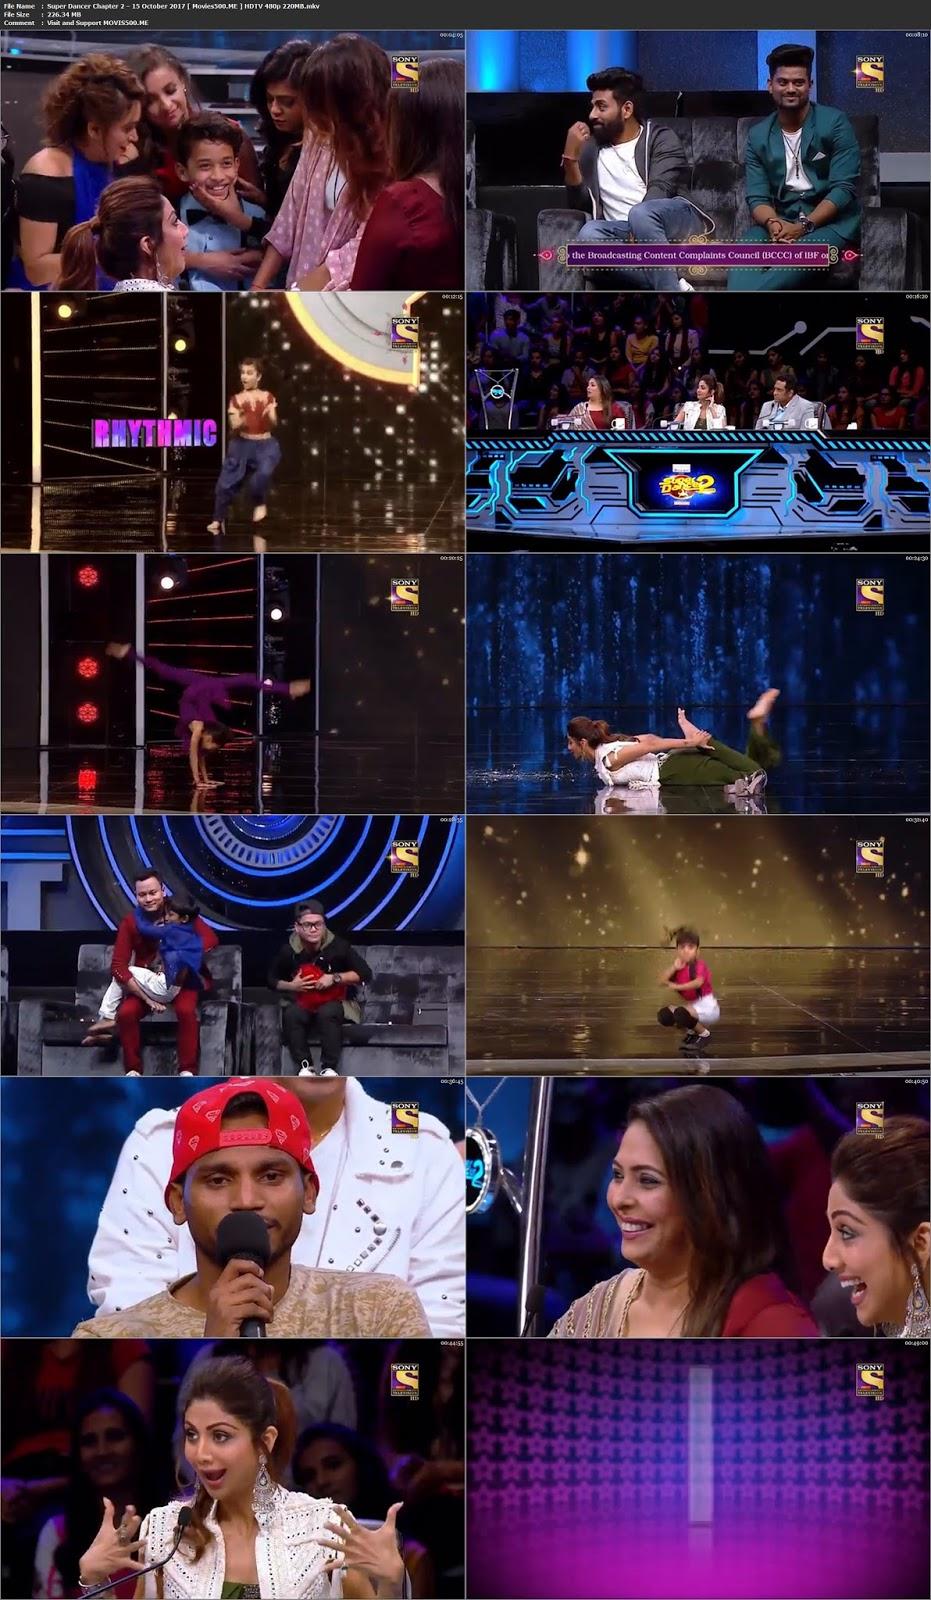 Super Dancer Chapter 2 2017 15 October 226MB HDTV 480p at mualfa.net